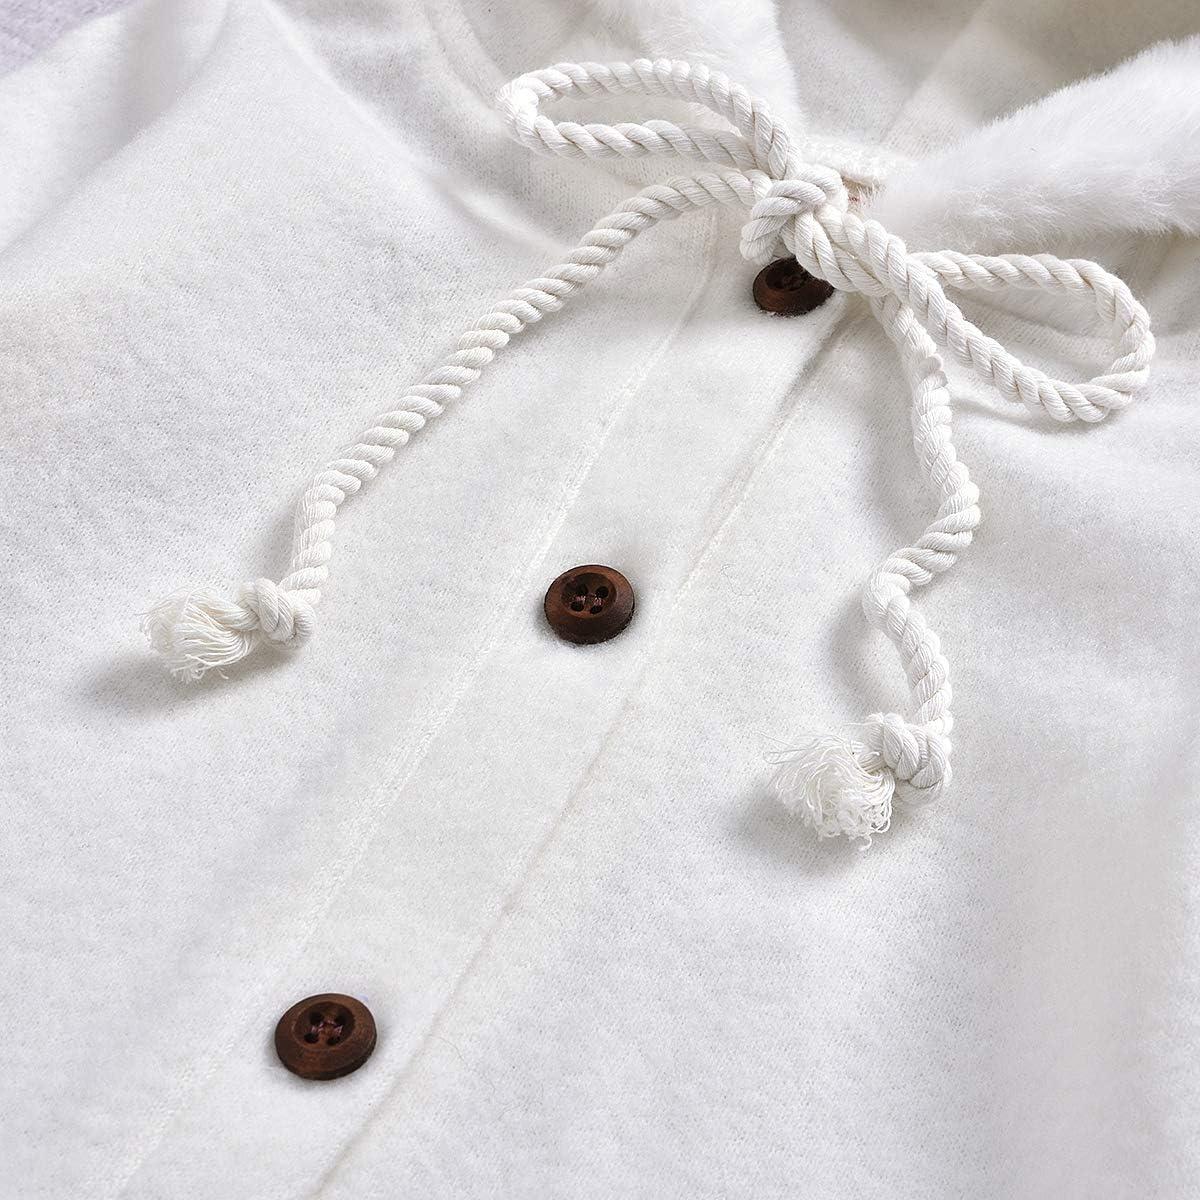 LddcryMbb Newborn Baby Boys Girls One-Piece Romper Long Sleeve Jumpsuit Bodysuit Clothes for 0-24Months